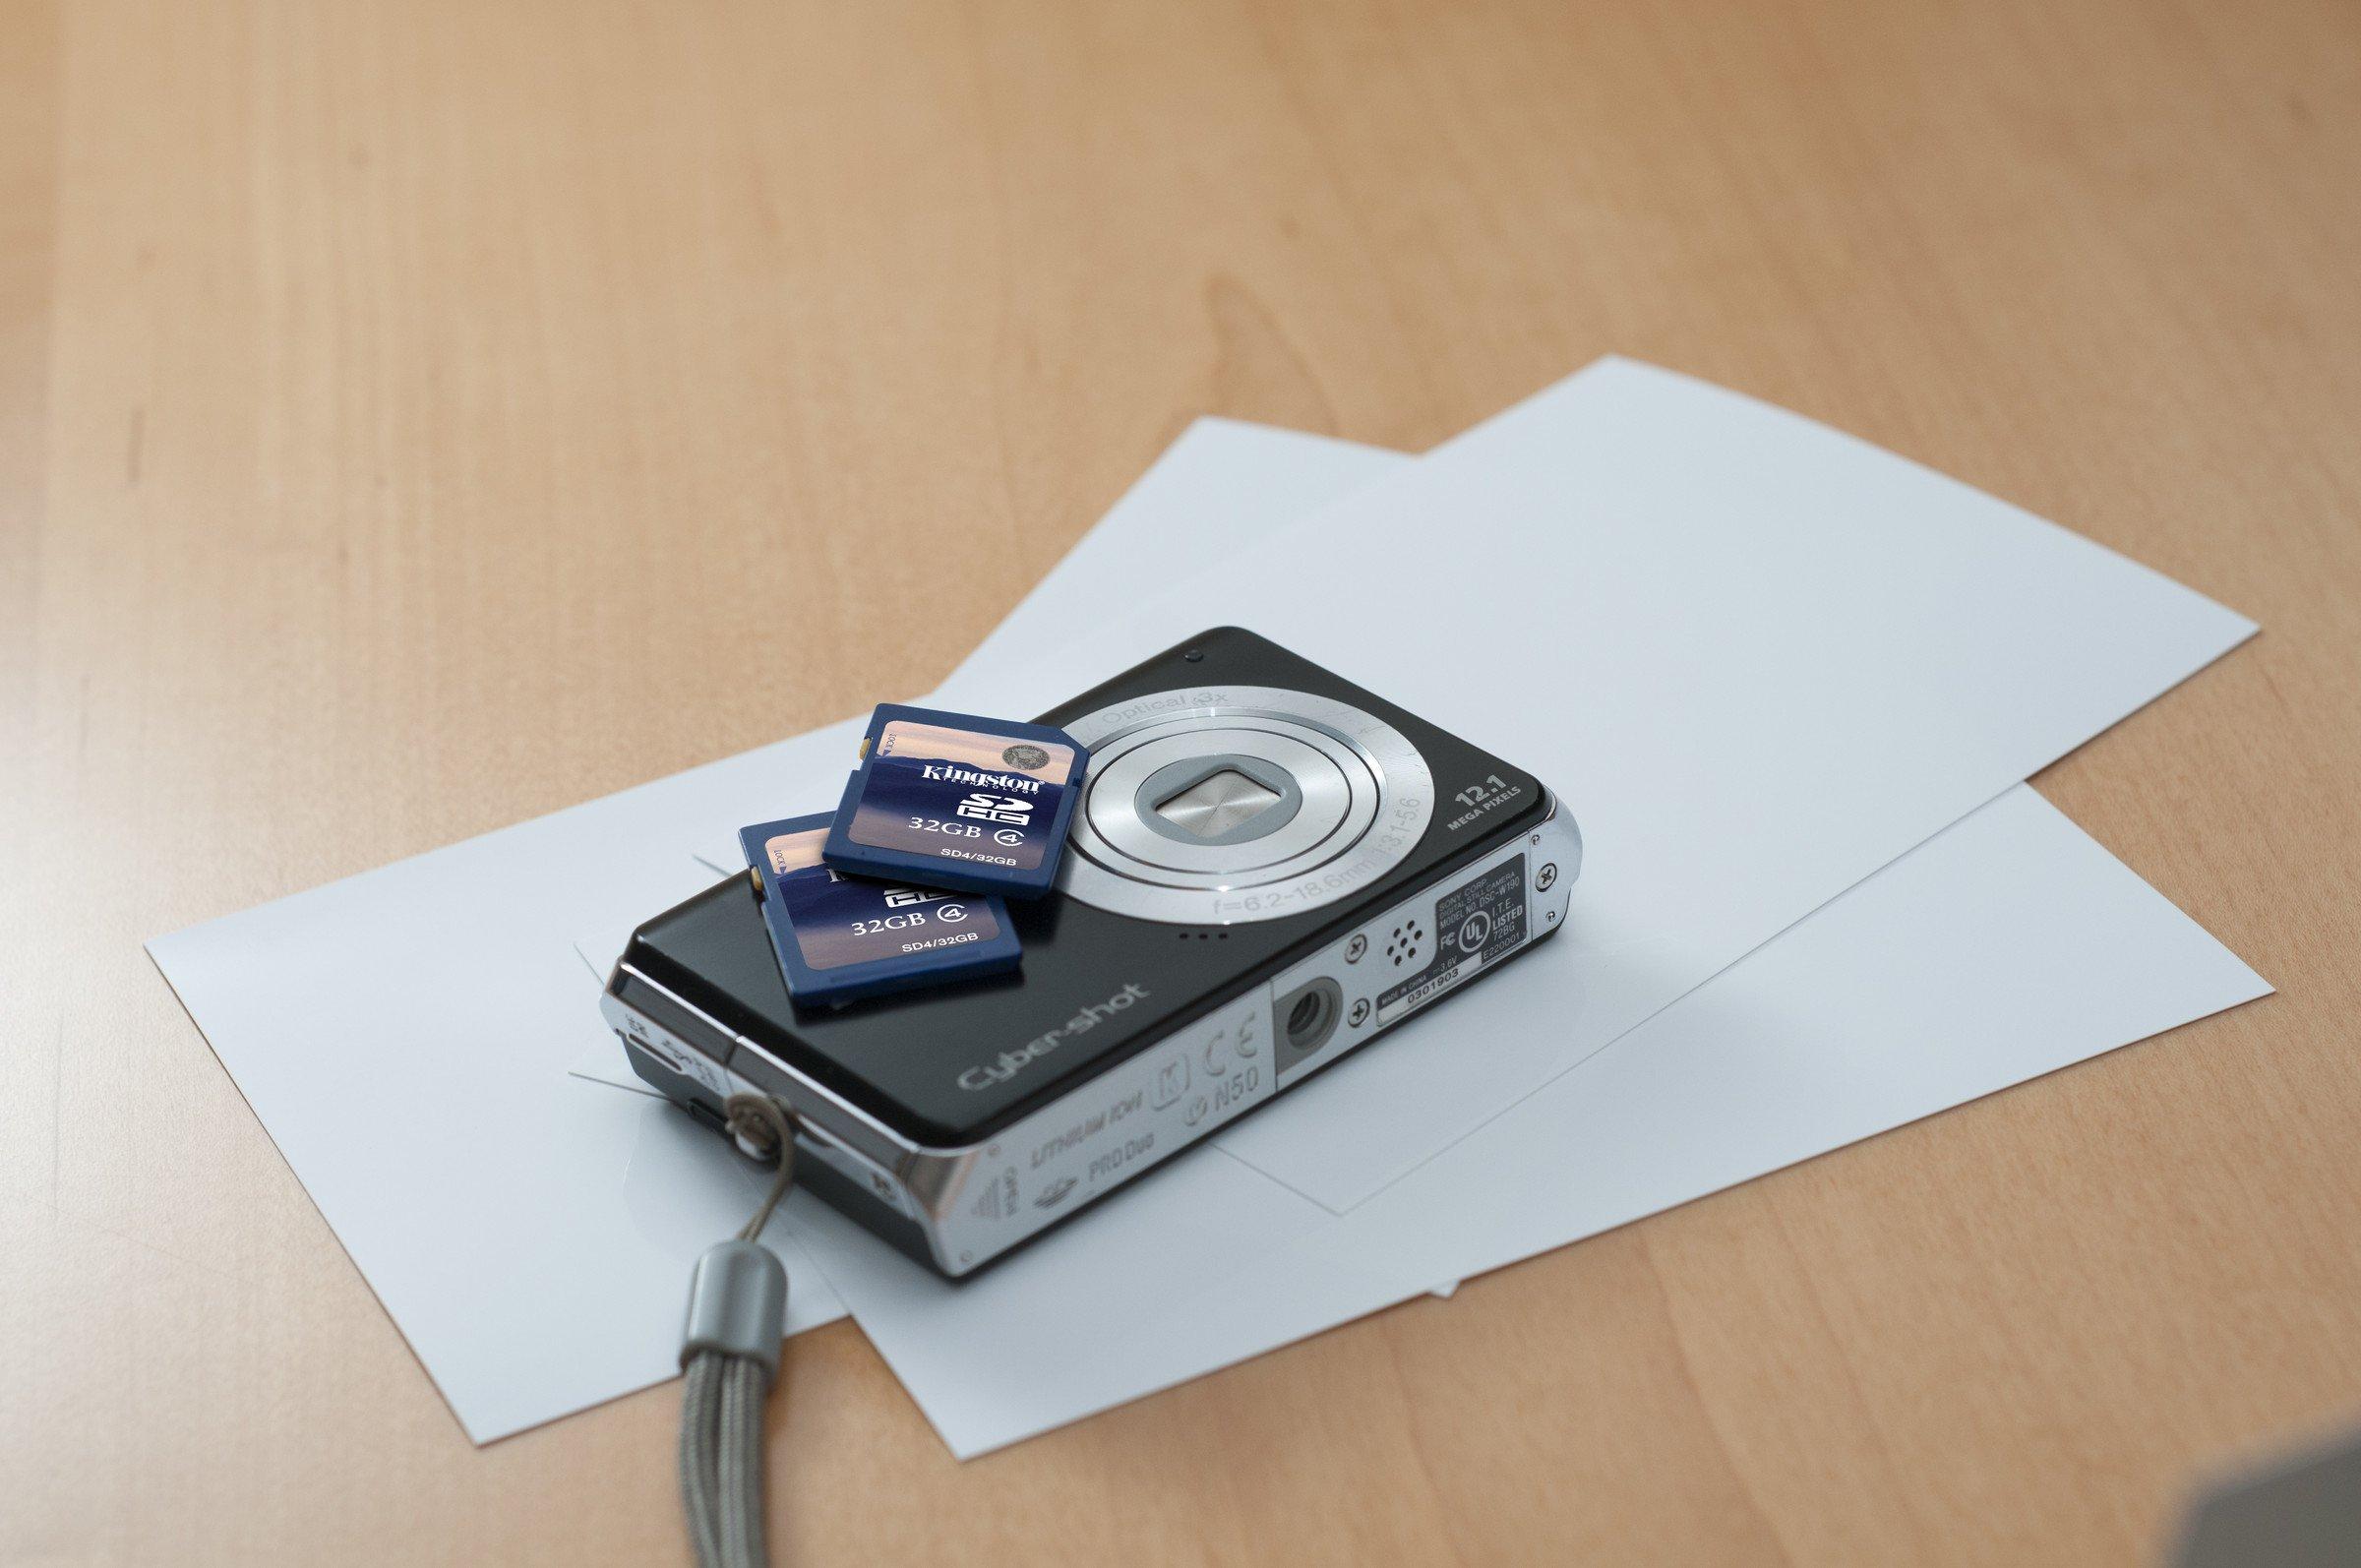 Kingston 4 GB Class 4 SDHC Flash Memory Card 2-Pack SD4/4GB-2P